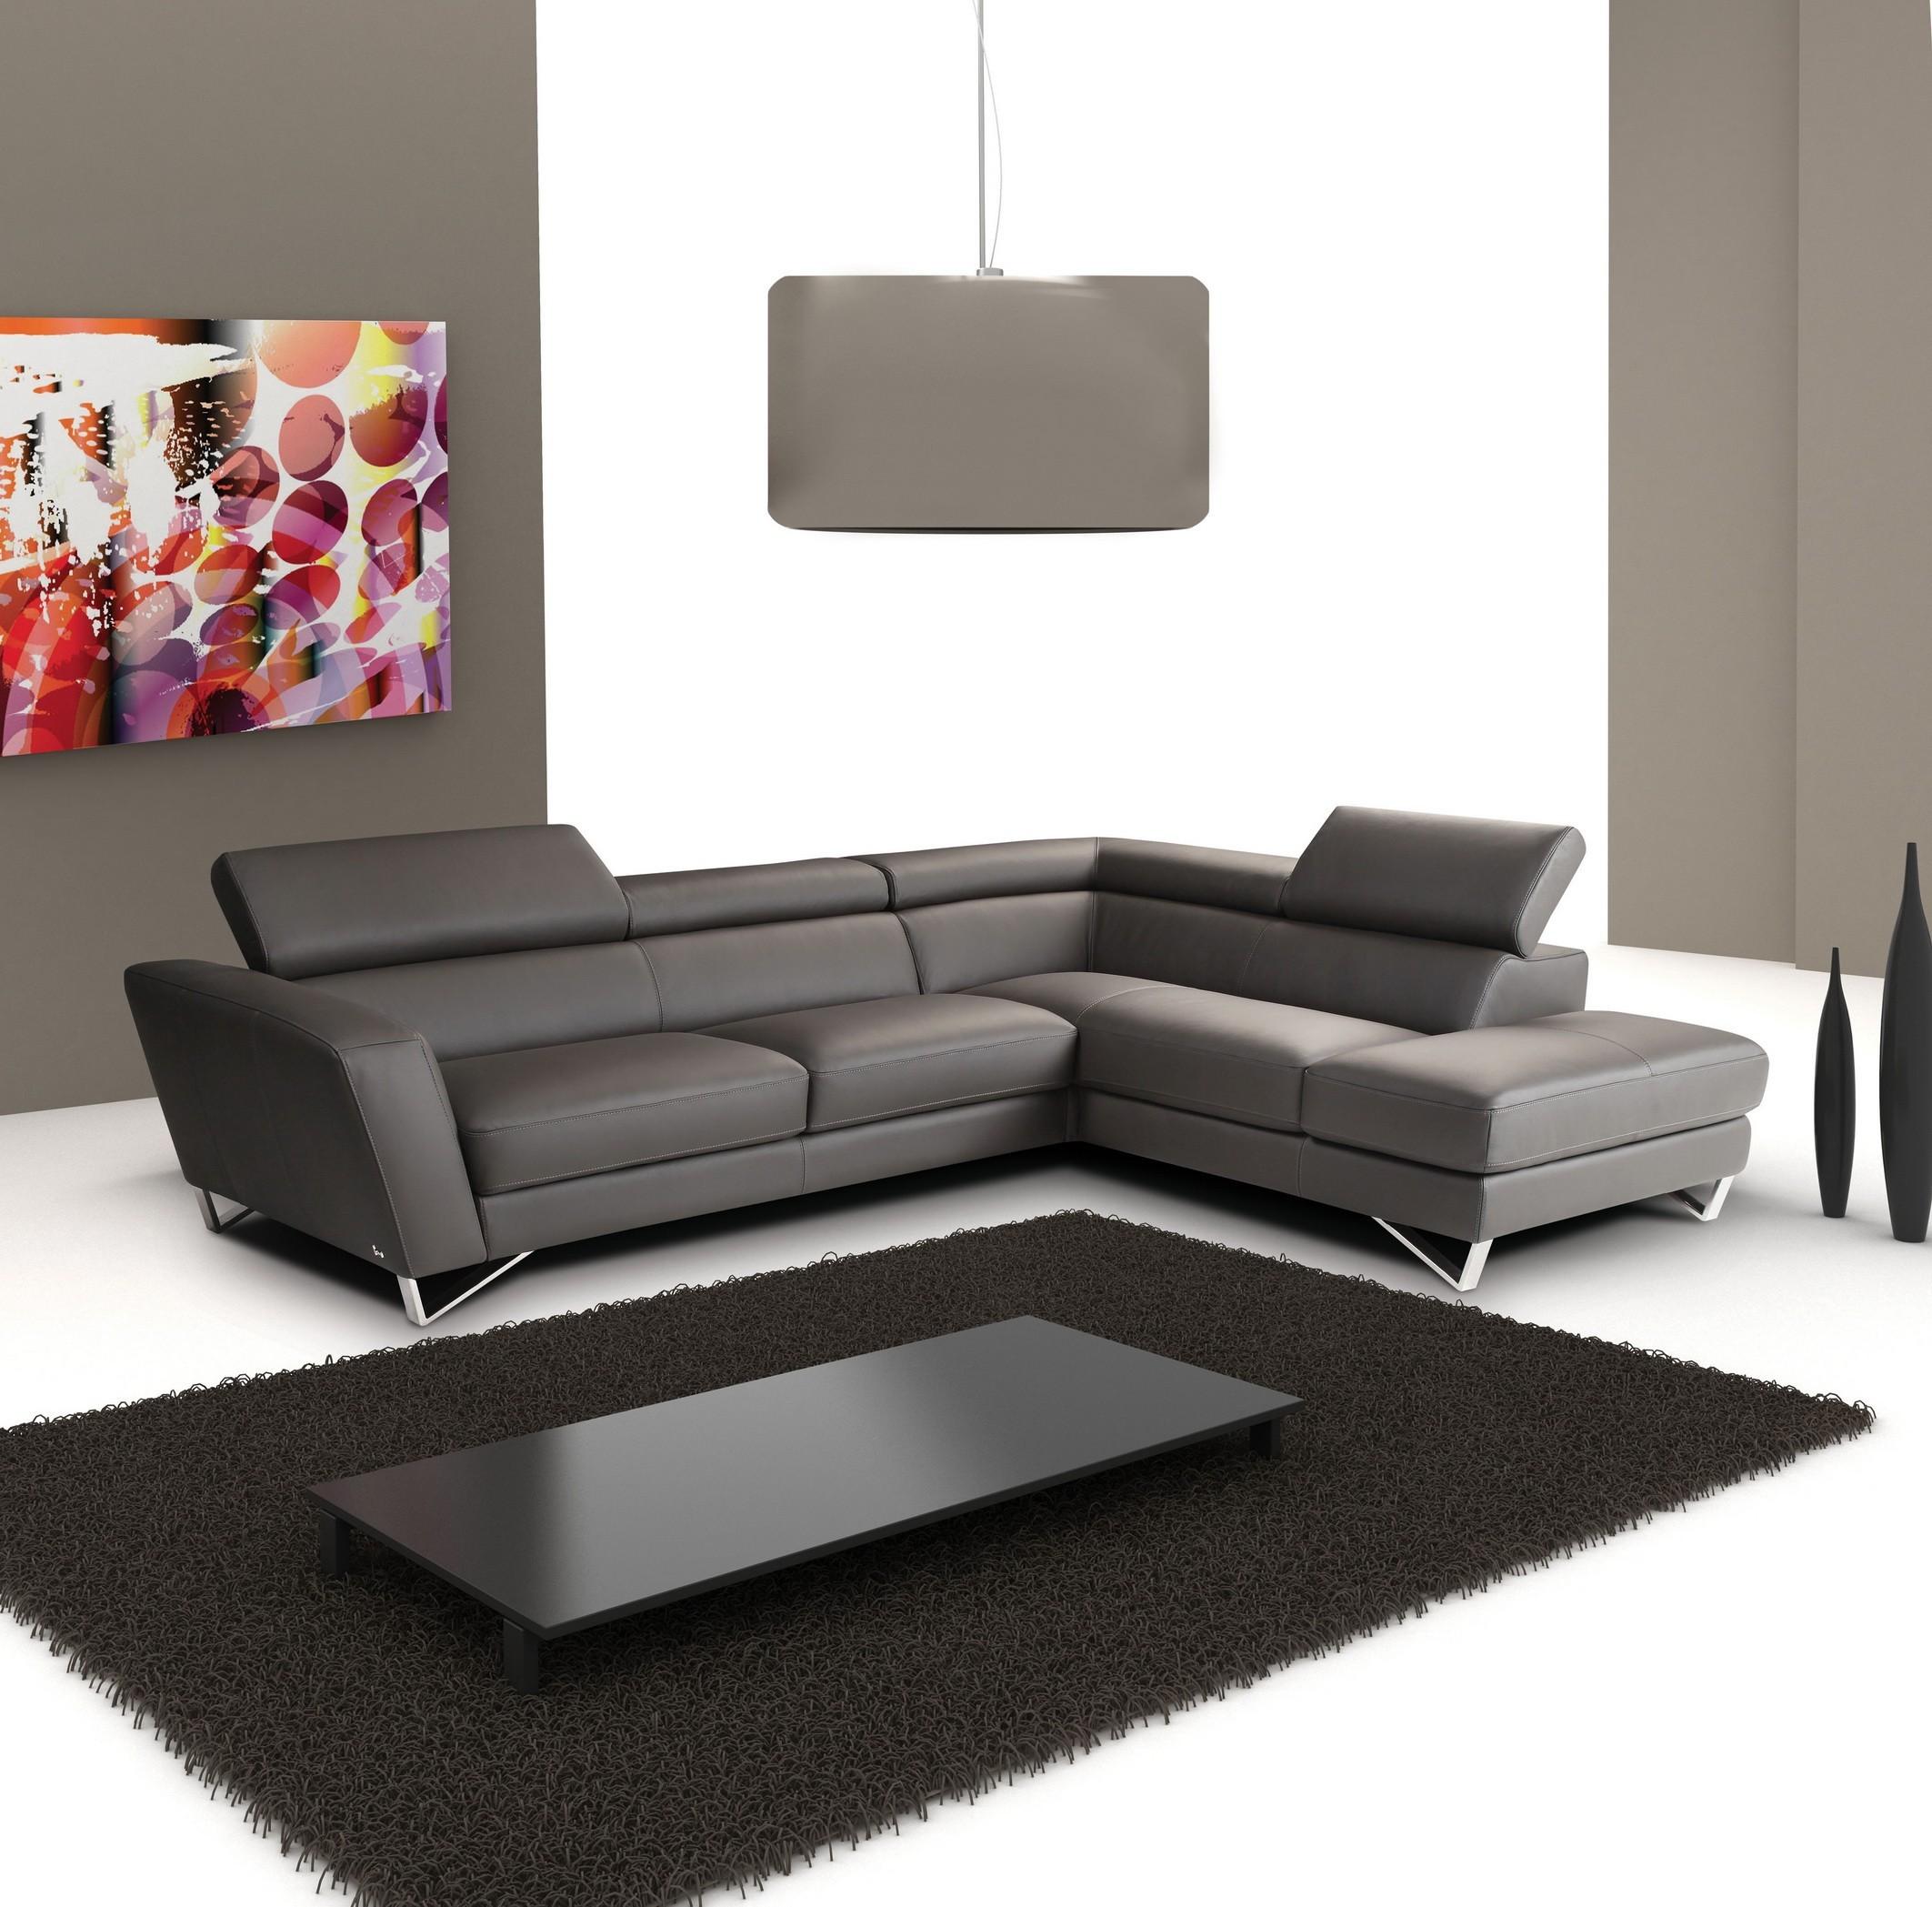 leather sectional sleeper sofa queen sofa sleeper sectional microfiber sectional sleeper sofa